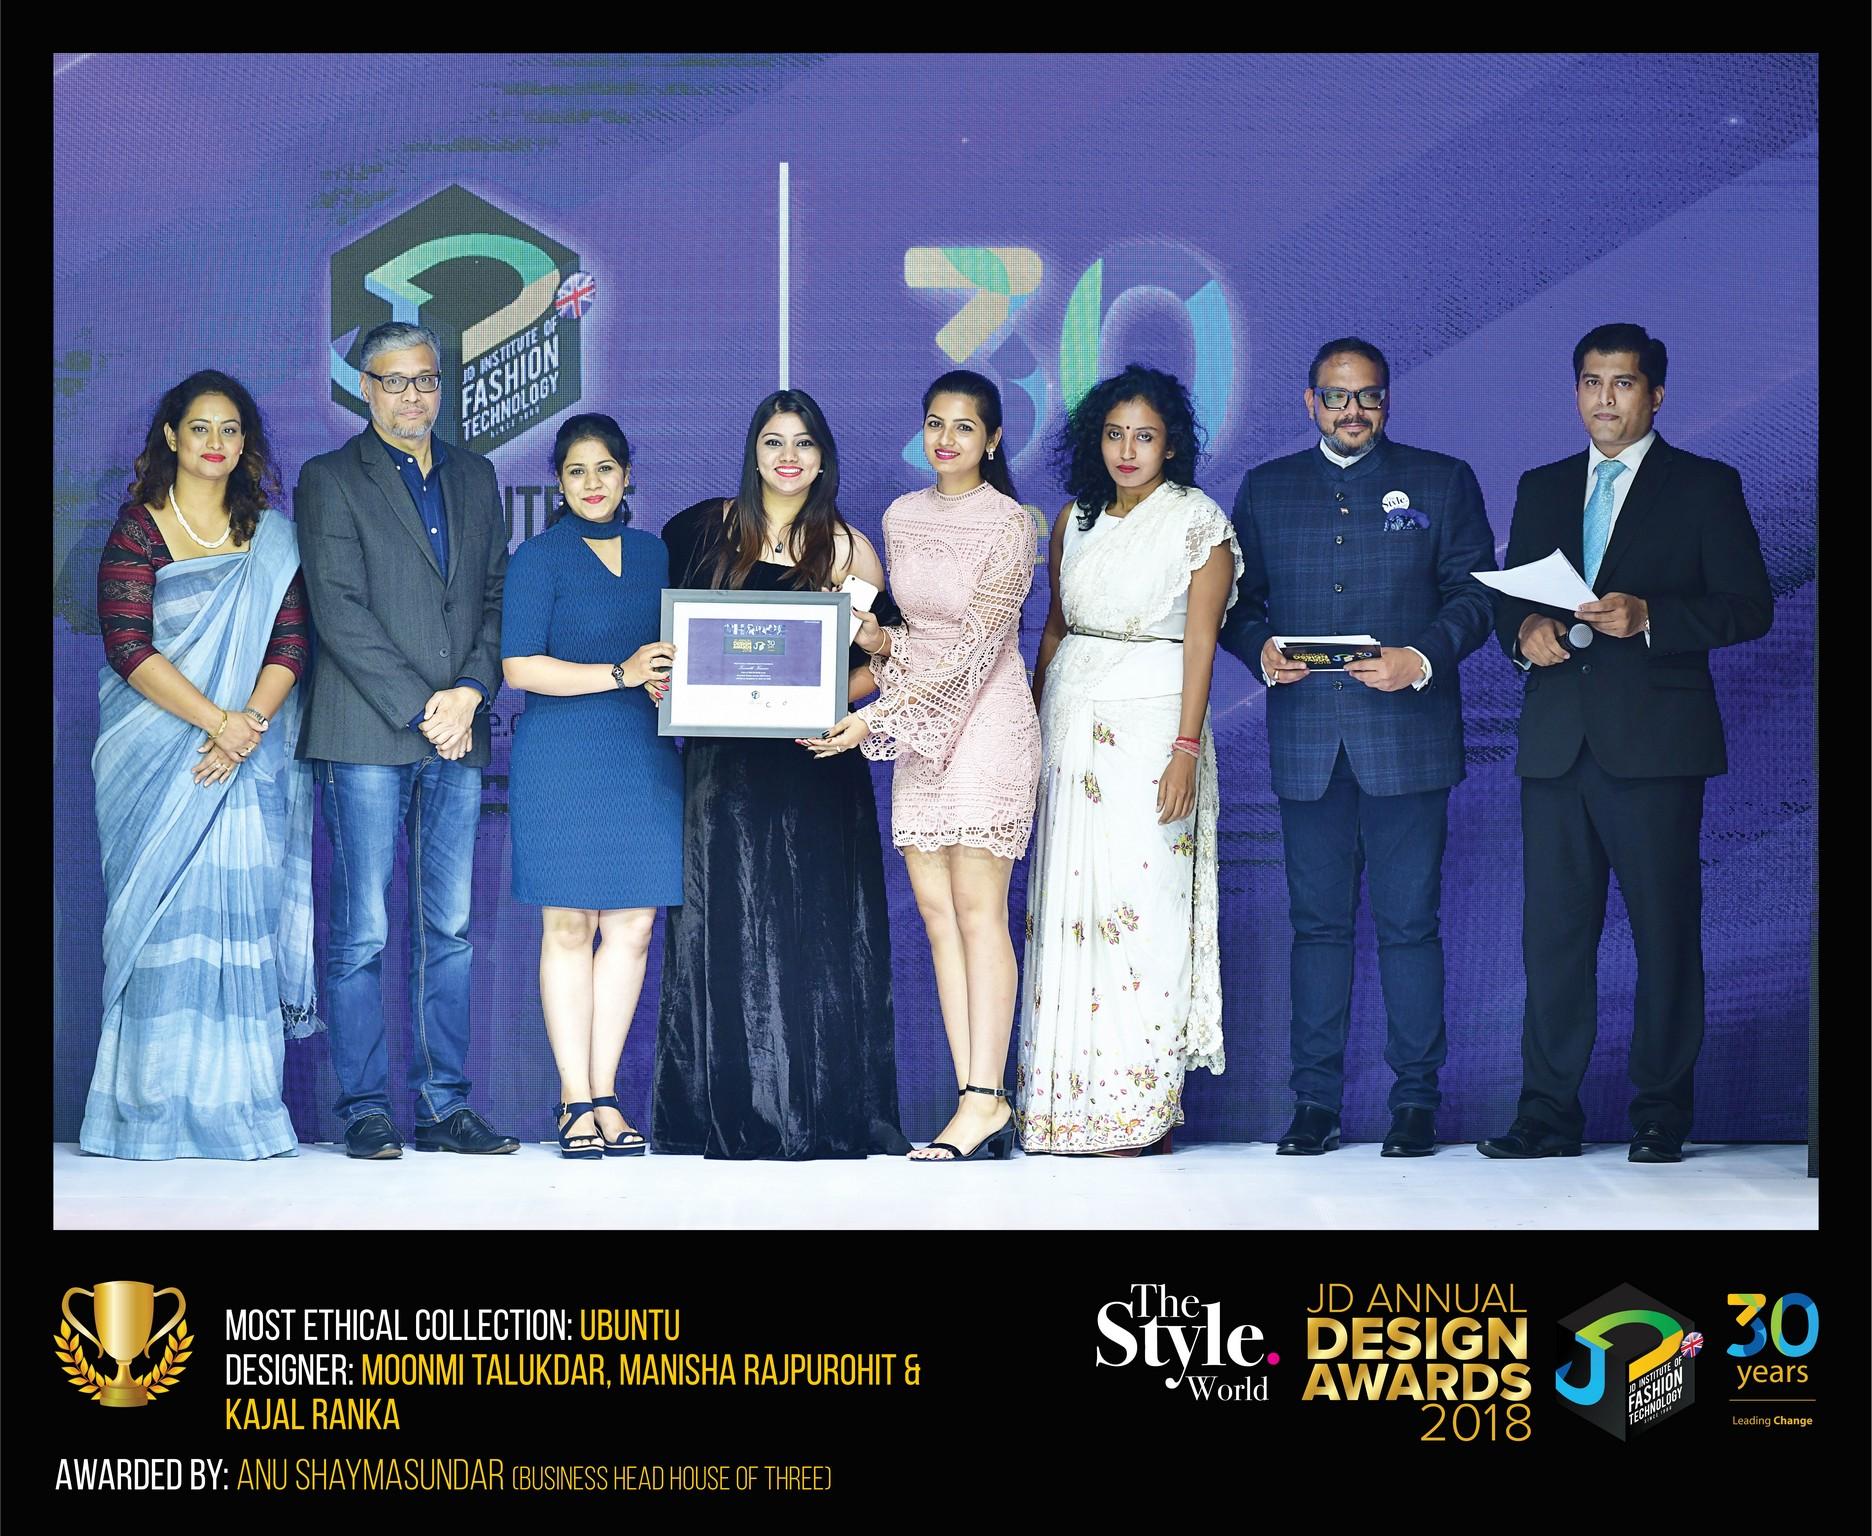 Ubuntu – Change – JD Annual Design Awards 2018 | Designer: Manisha, Kajal and Moonmi | Photography : Jerin Nath (@jerin_nath) ubuntu - UBUNTU - Ubuntu – Change – JD Annual Design Awards 2018